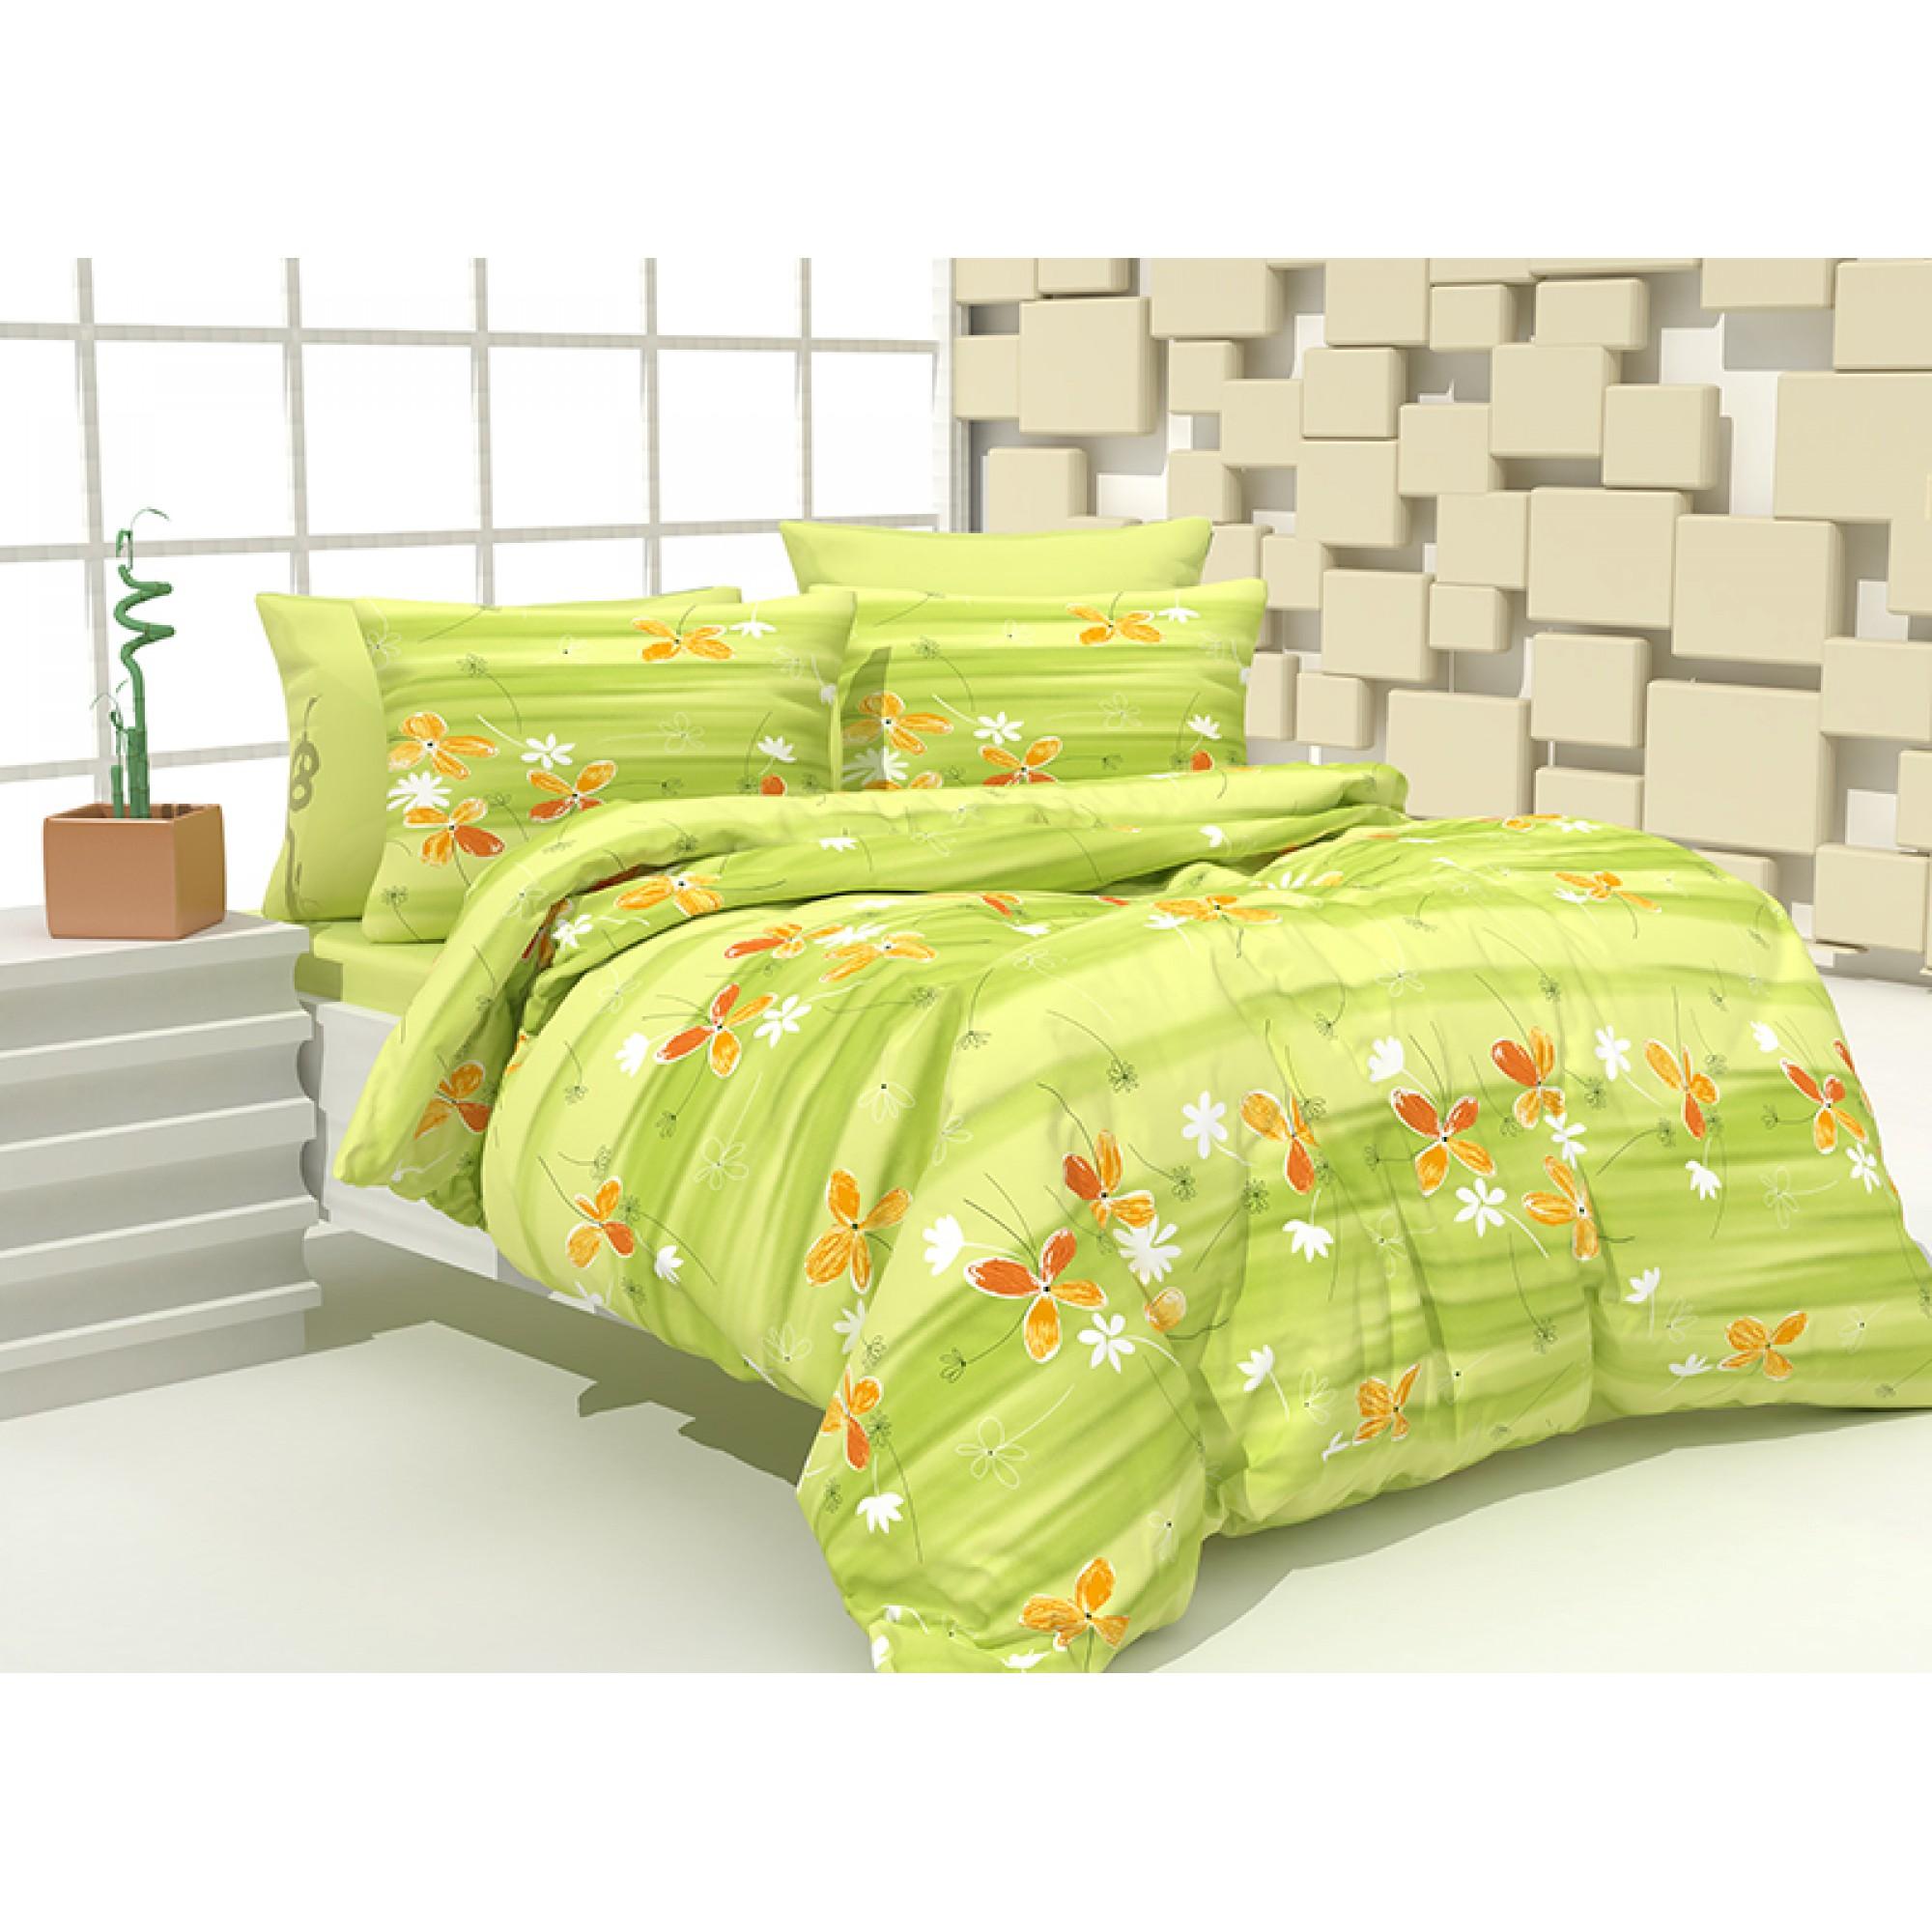 Спално бельо Градина от 100% Памук